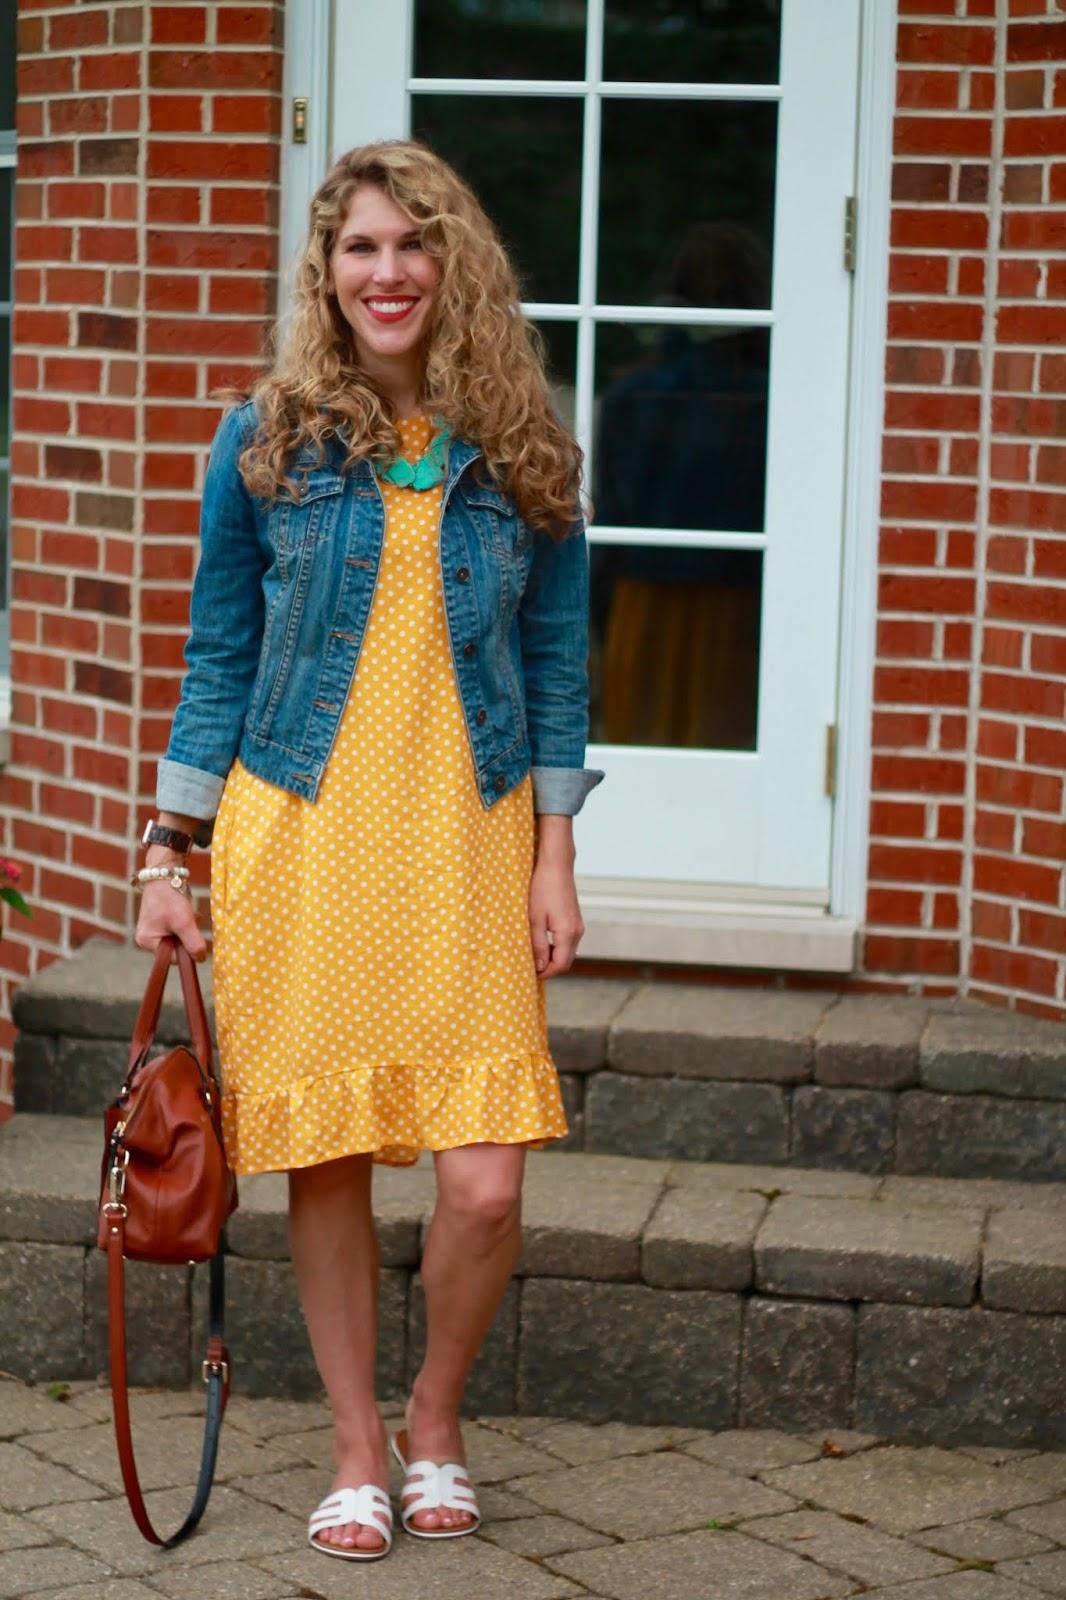 yellow polka dot dress, denim jacket, white slides, cognac satchel, turquoise necklace